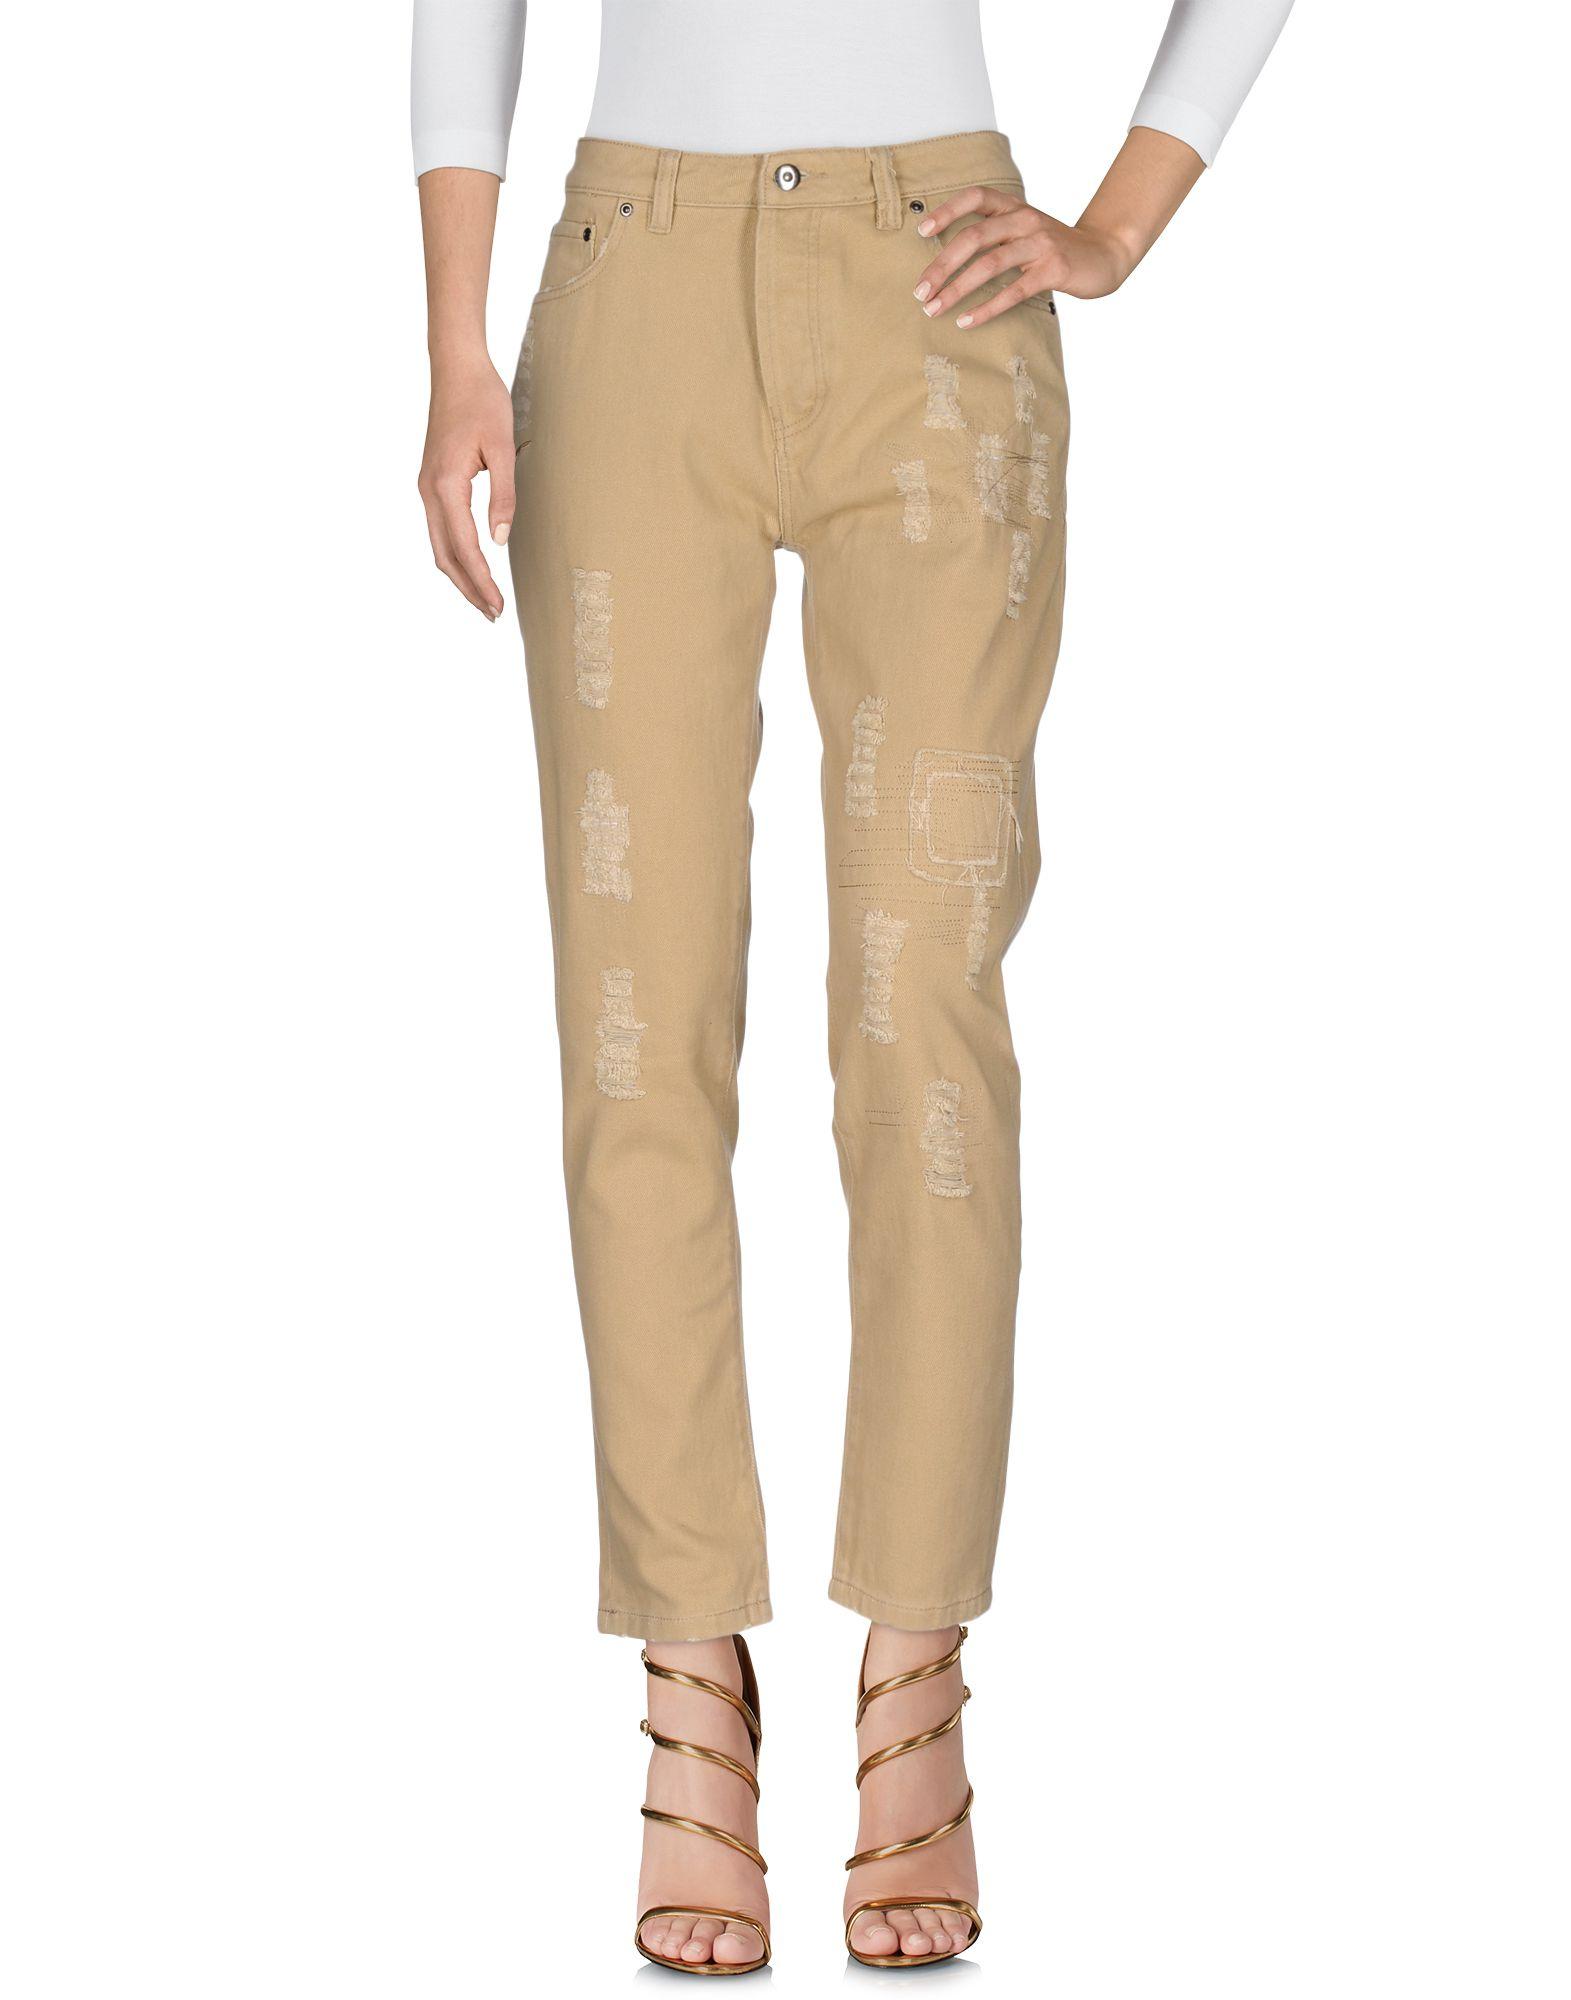 PUBLISH Джинсовые брюки муфта для ног voksi urban pale pink 3132605